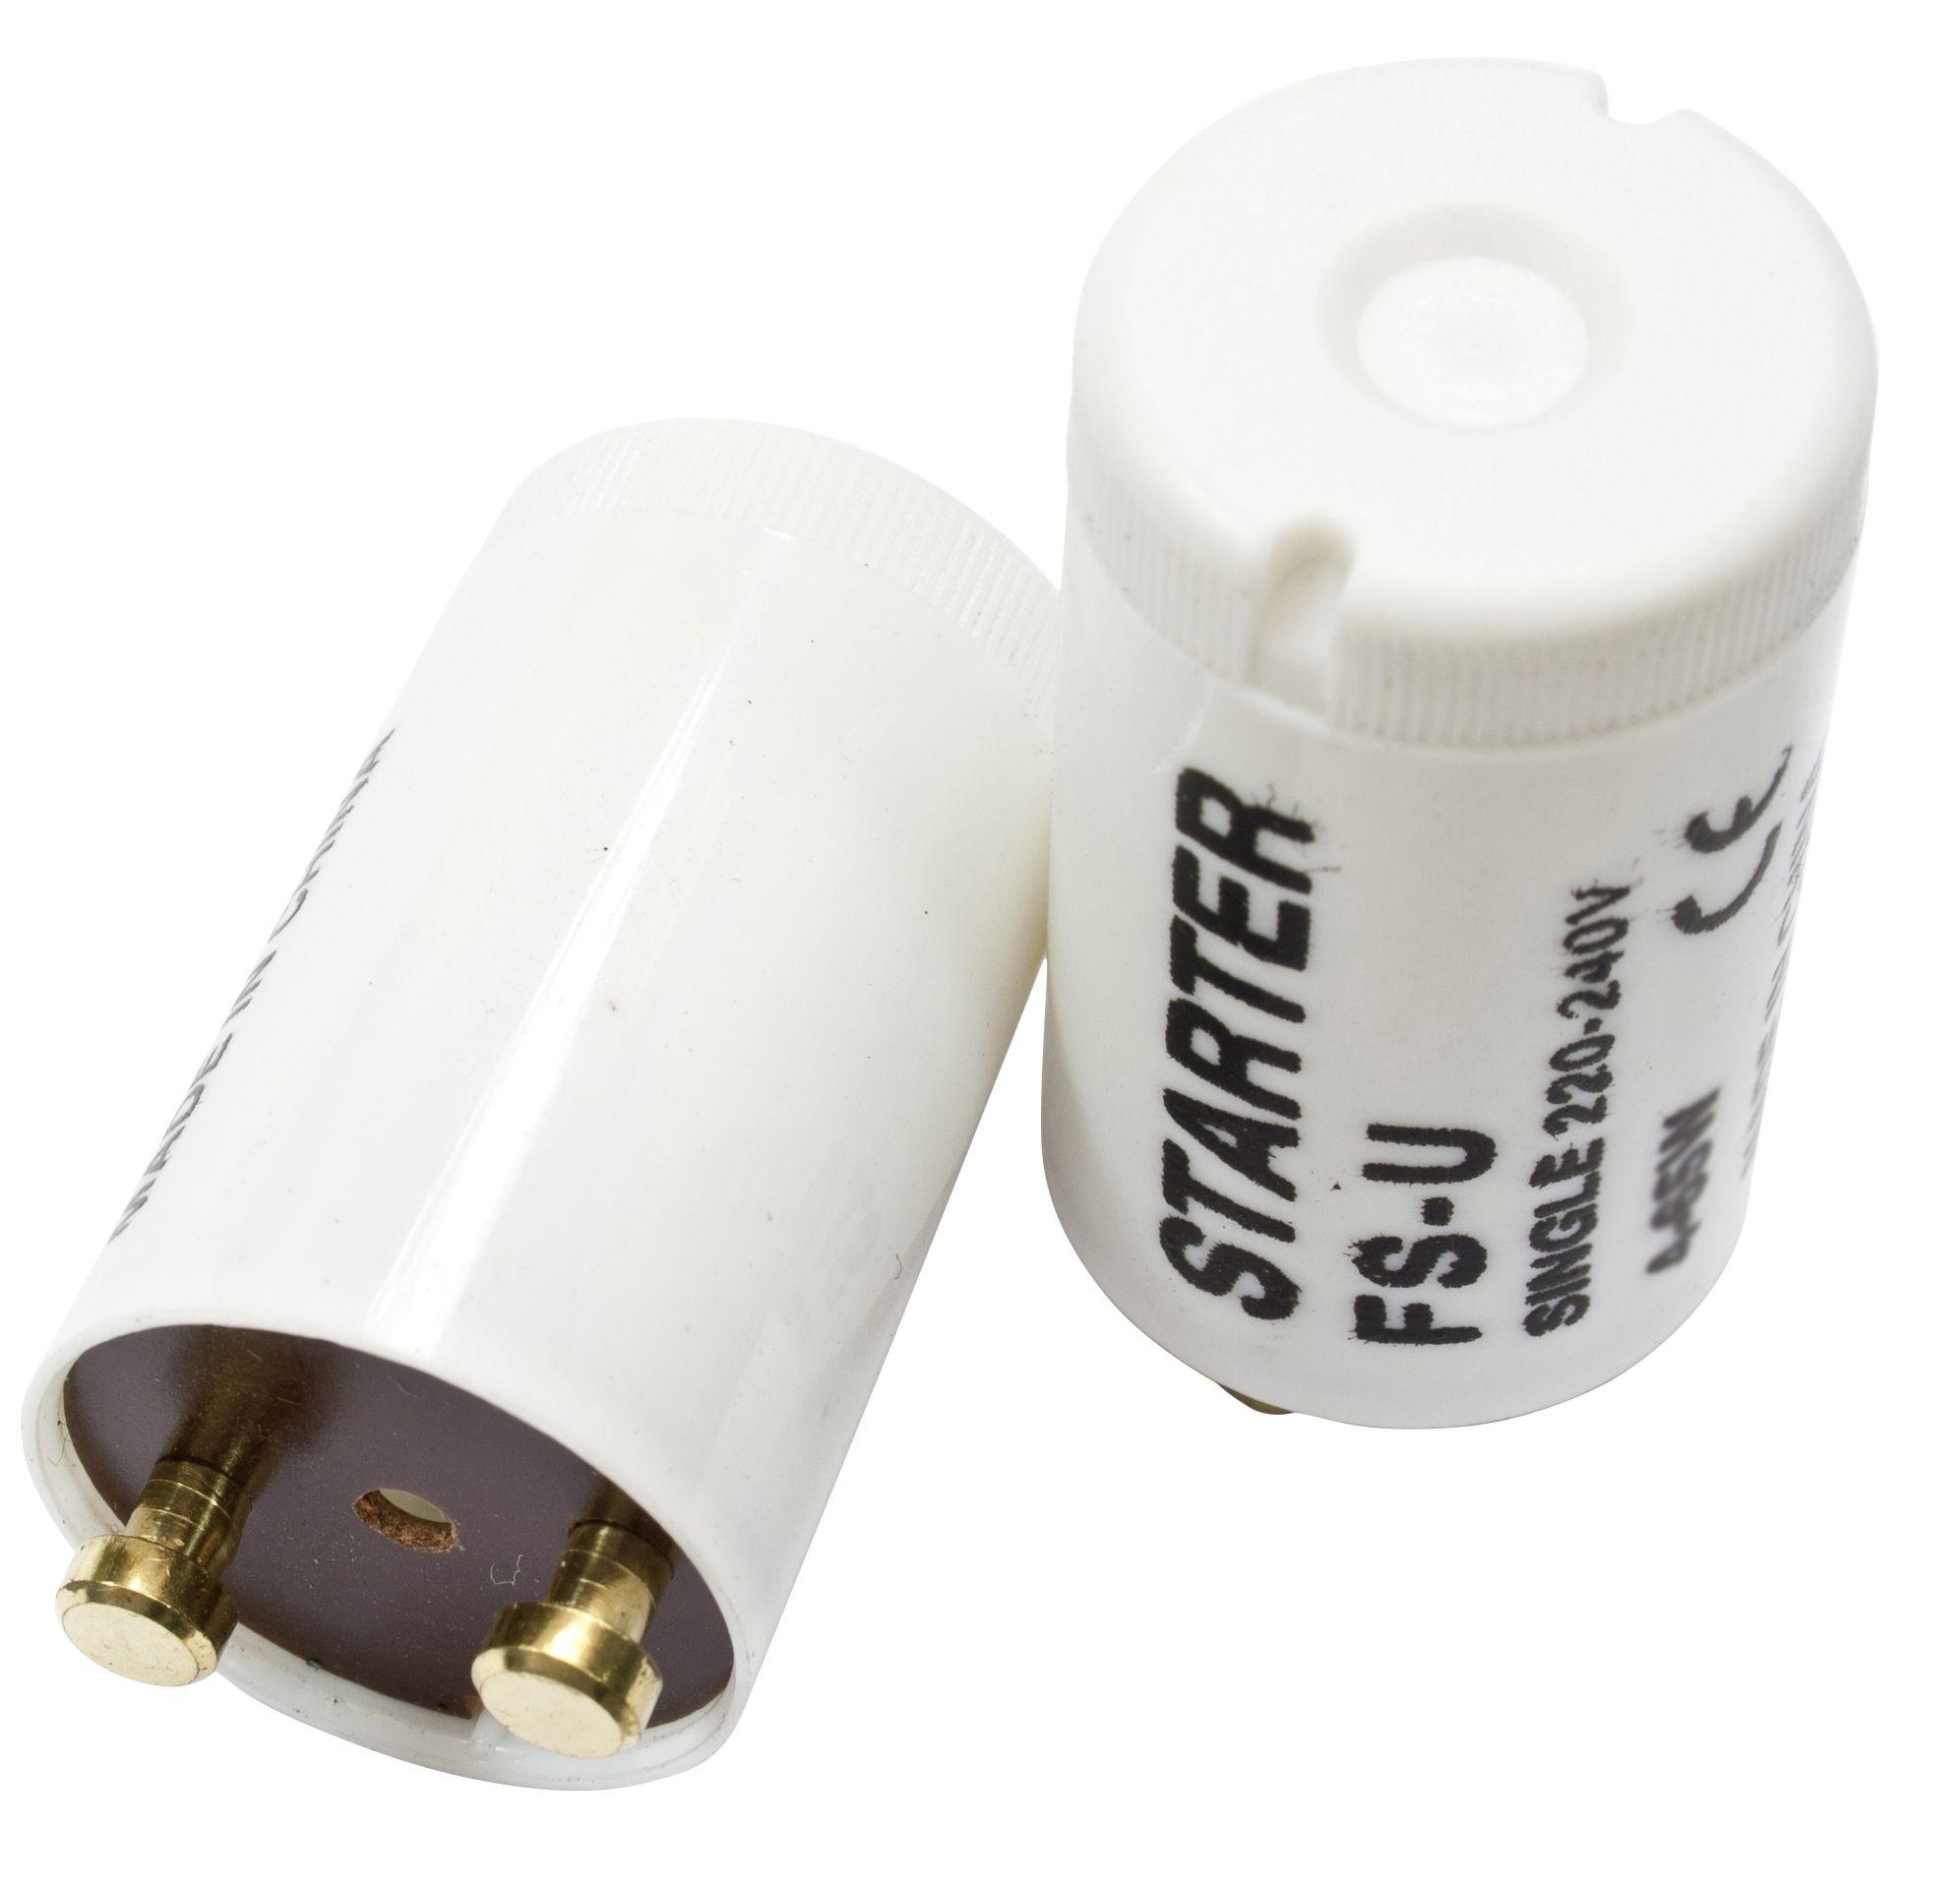 Bathroom Light Toolstation b&q fluorescent starter switch 240v 4-65w | departments | diy at b&q